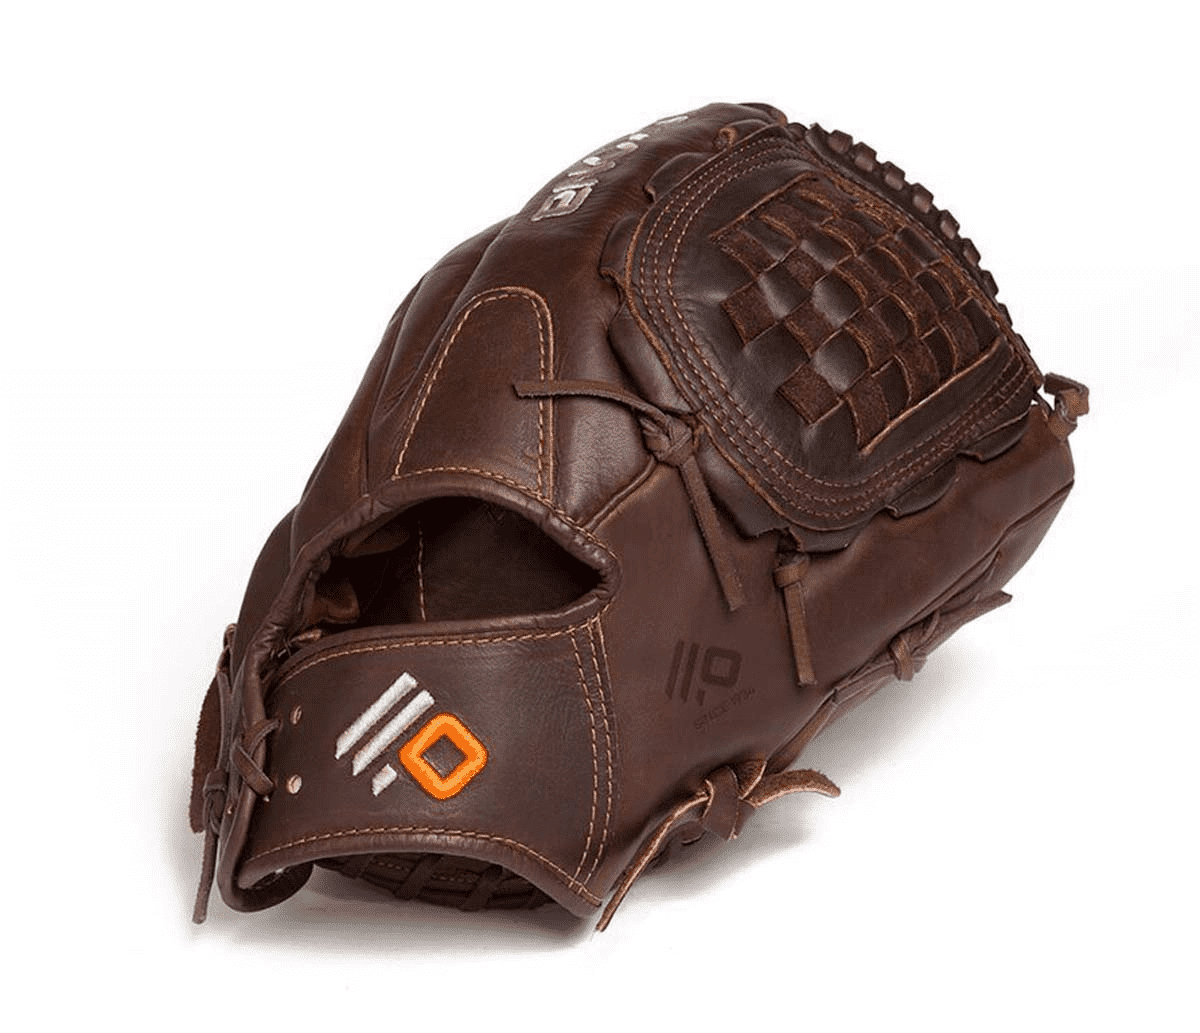 nokona-x2-1300c-softball-glove-13-inch-right-hand-throw X2-1300C-Right Hand Throw Nokona 808808889588 13 Pattern Medium Weight Game Ready Made in the USA. Nokona's